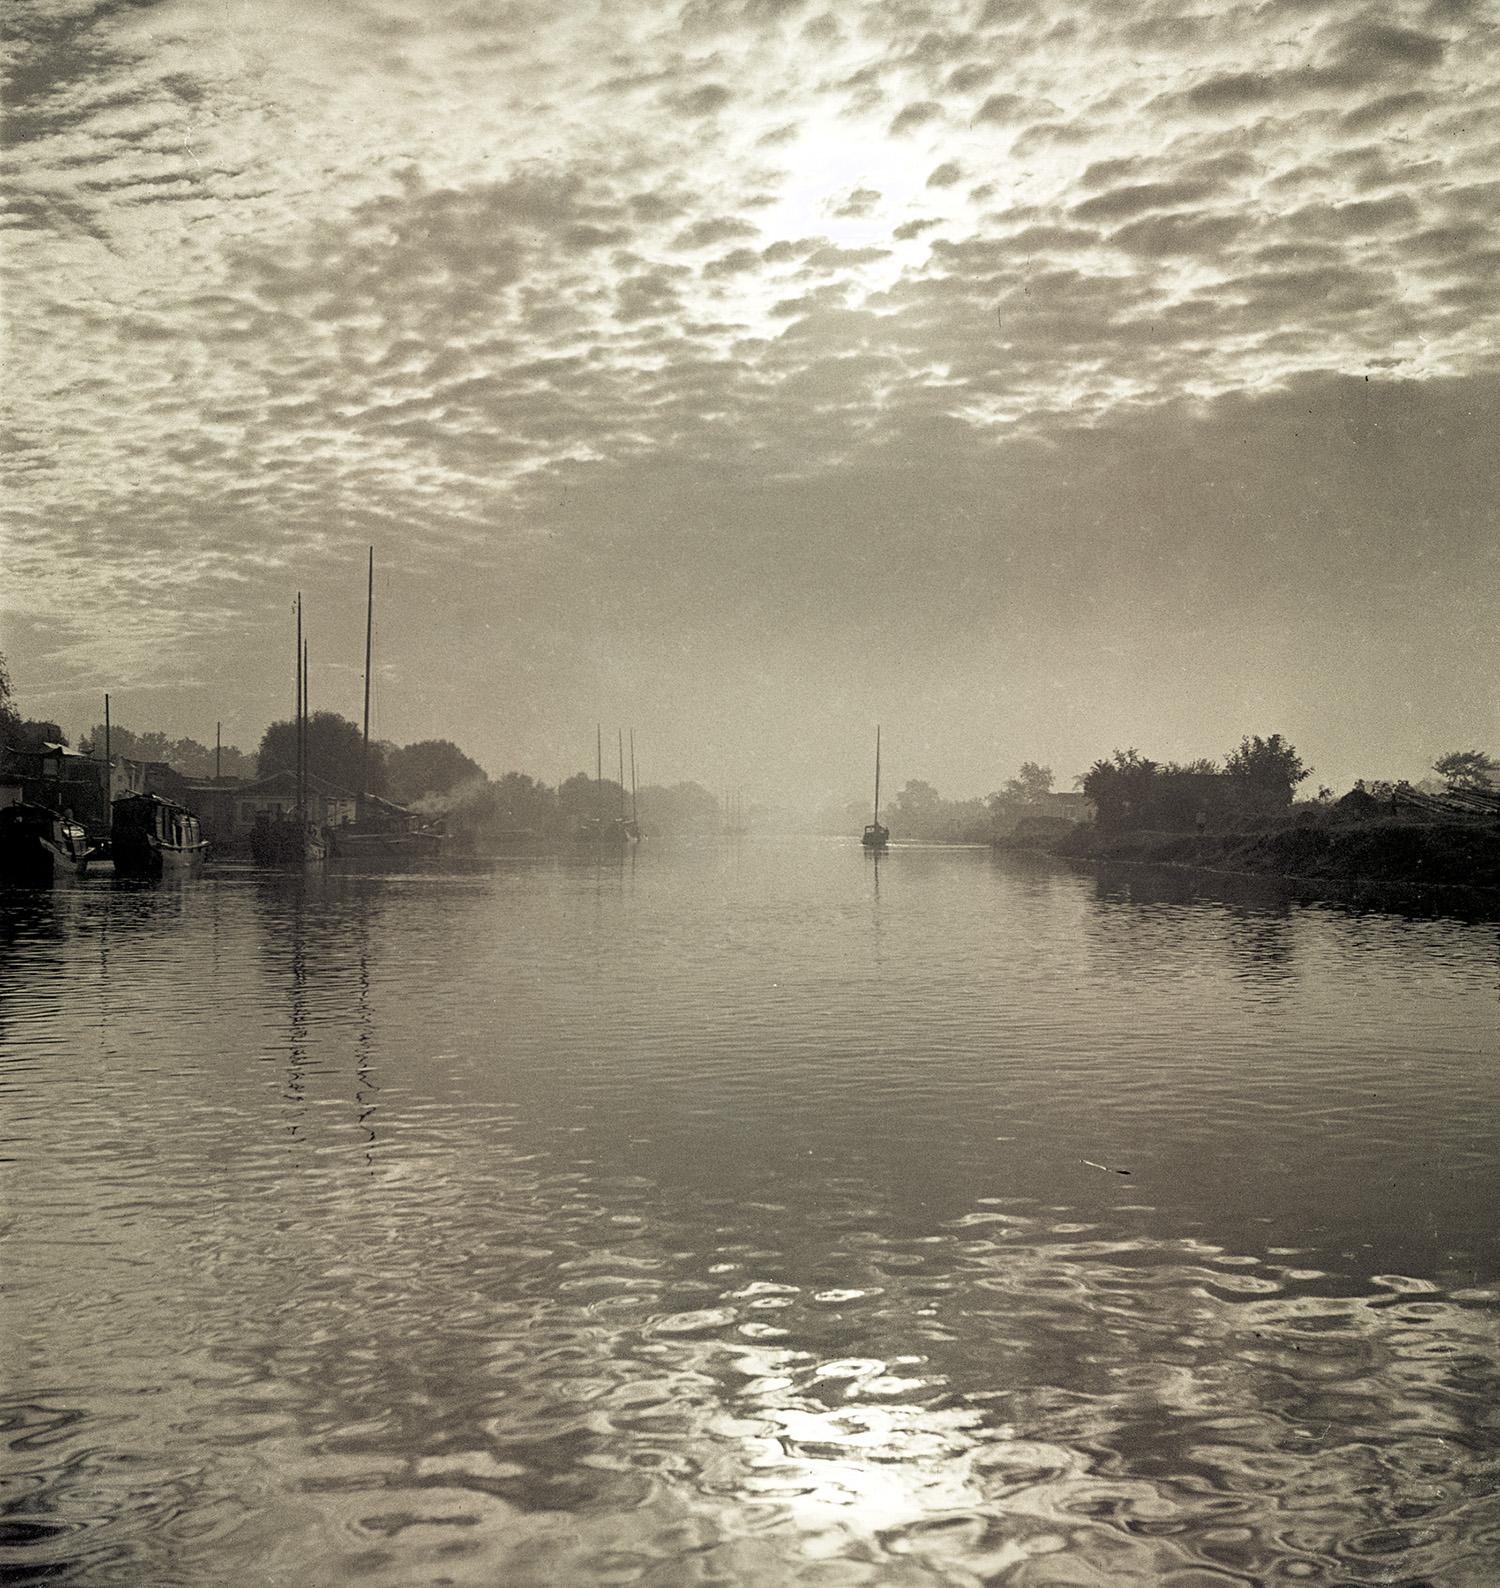 扬州运河, Canal in Yangzhou, 1935 / Courtesy of Jin Hua